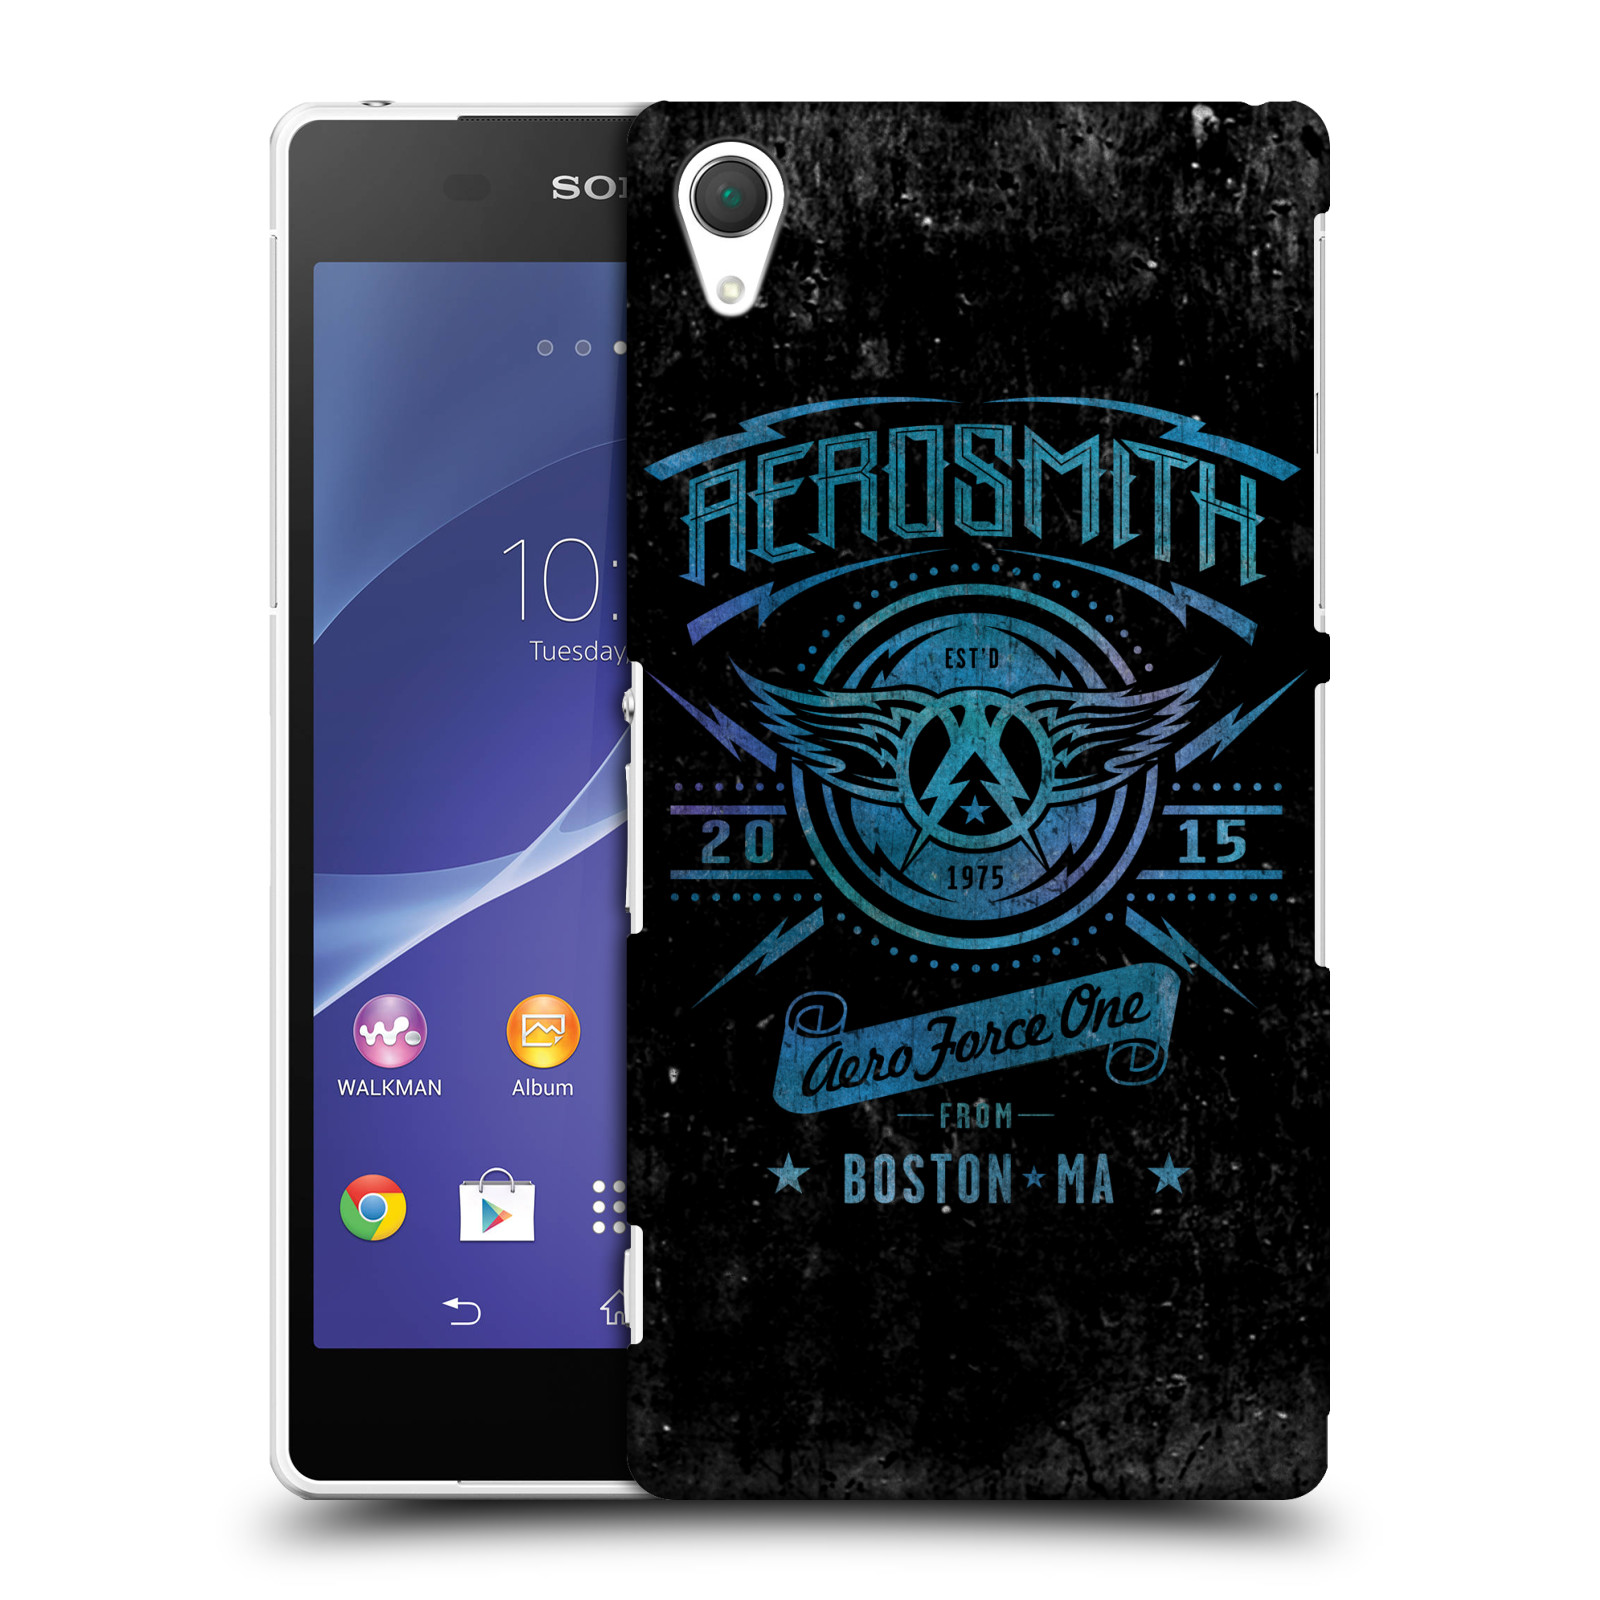 Plastové pouzdro na mobil Sony Xperia Z2 D6503 HEAD CASE - Aerosmith - Aero Force One